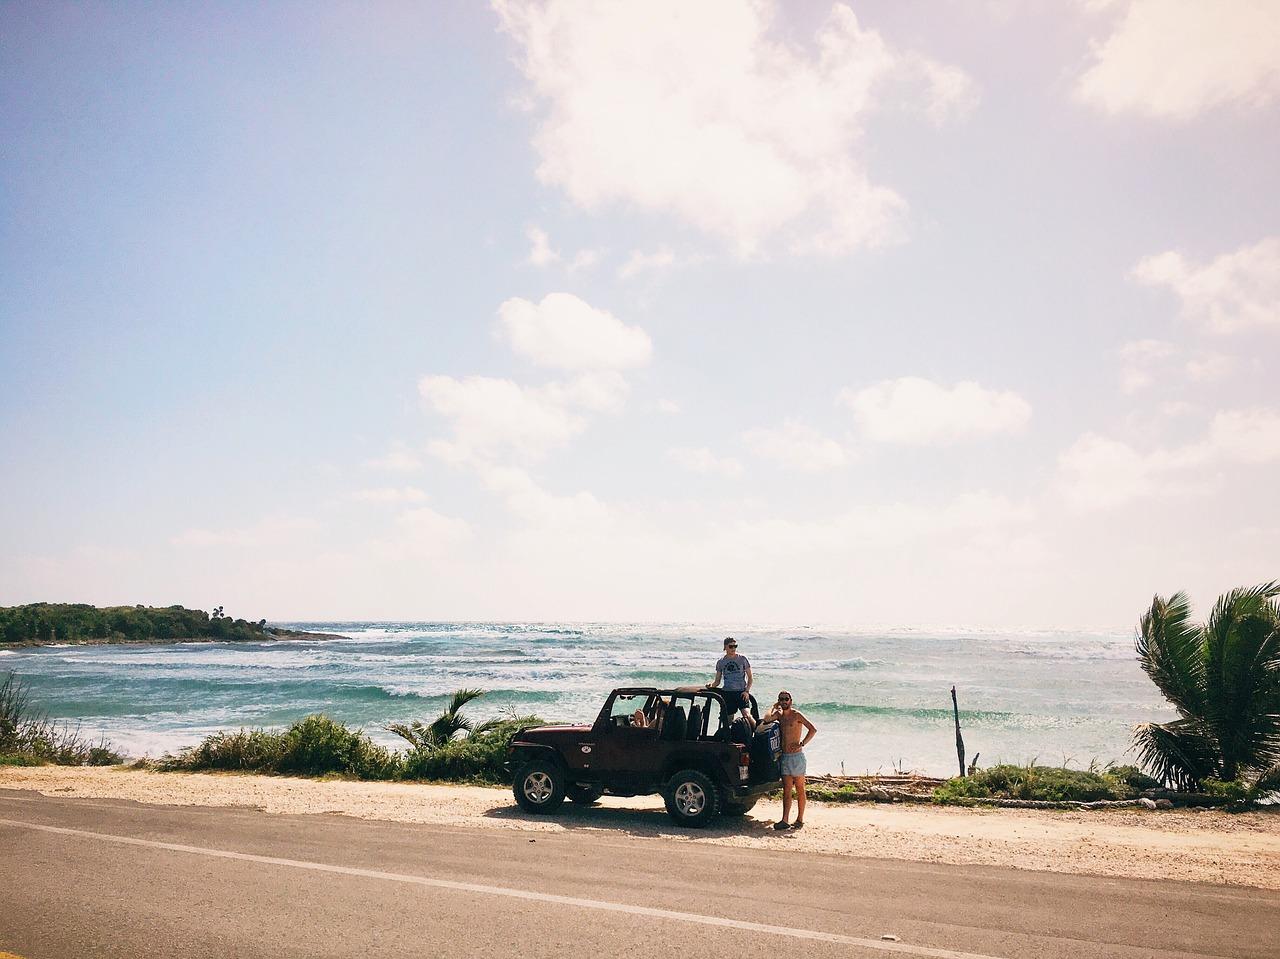 How to prepare for a road trip | Travel blog | Elle Blonde Luxury Lifestyle Destination Blog